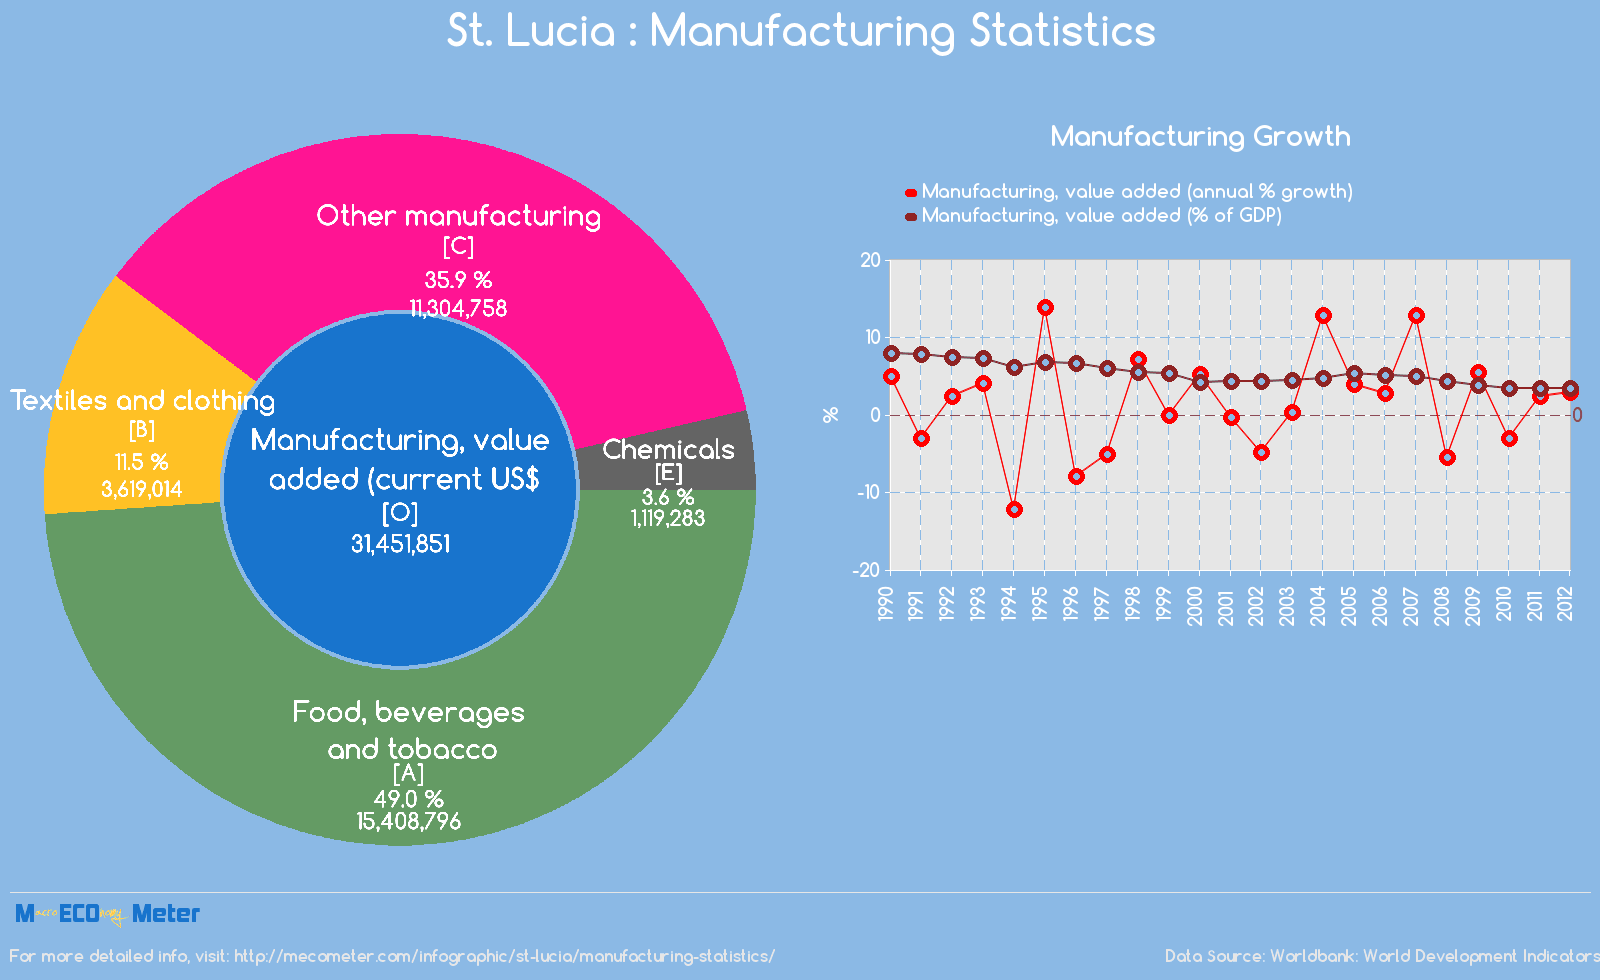 St. Lucia : Manufacturing Statistics